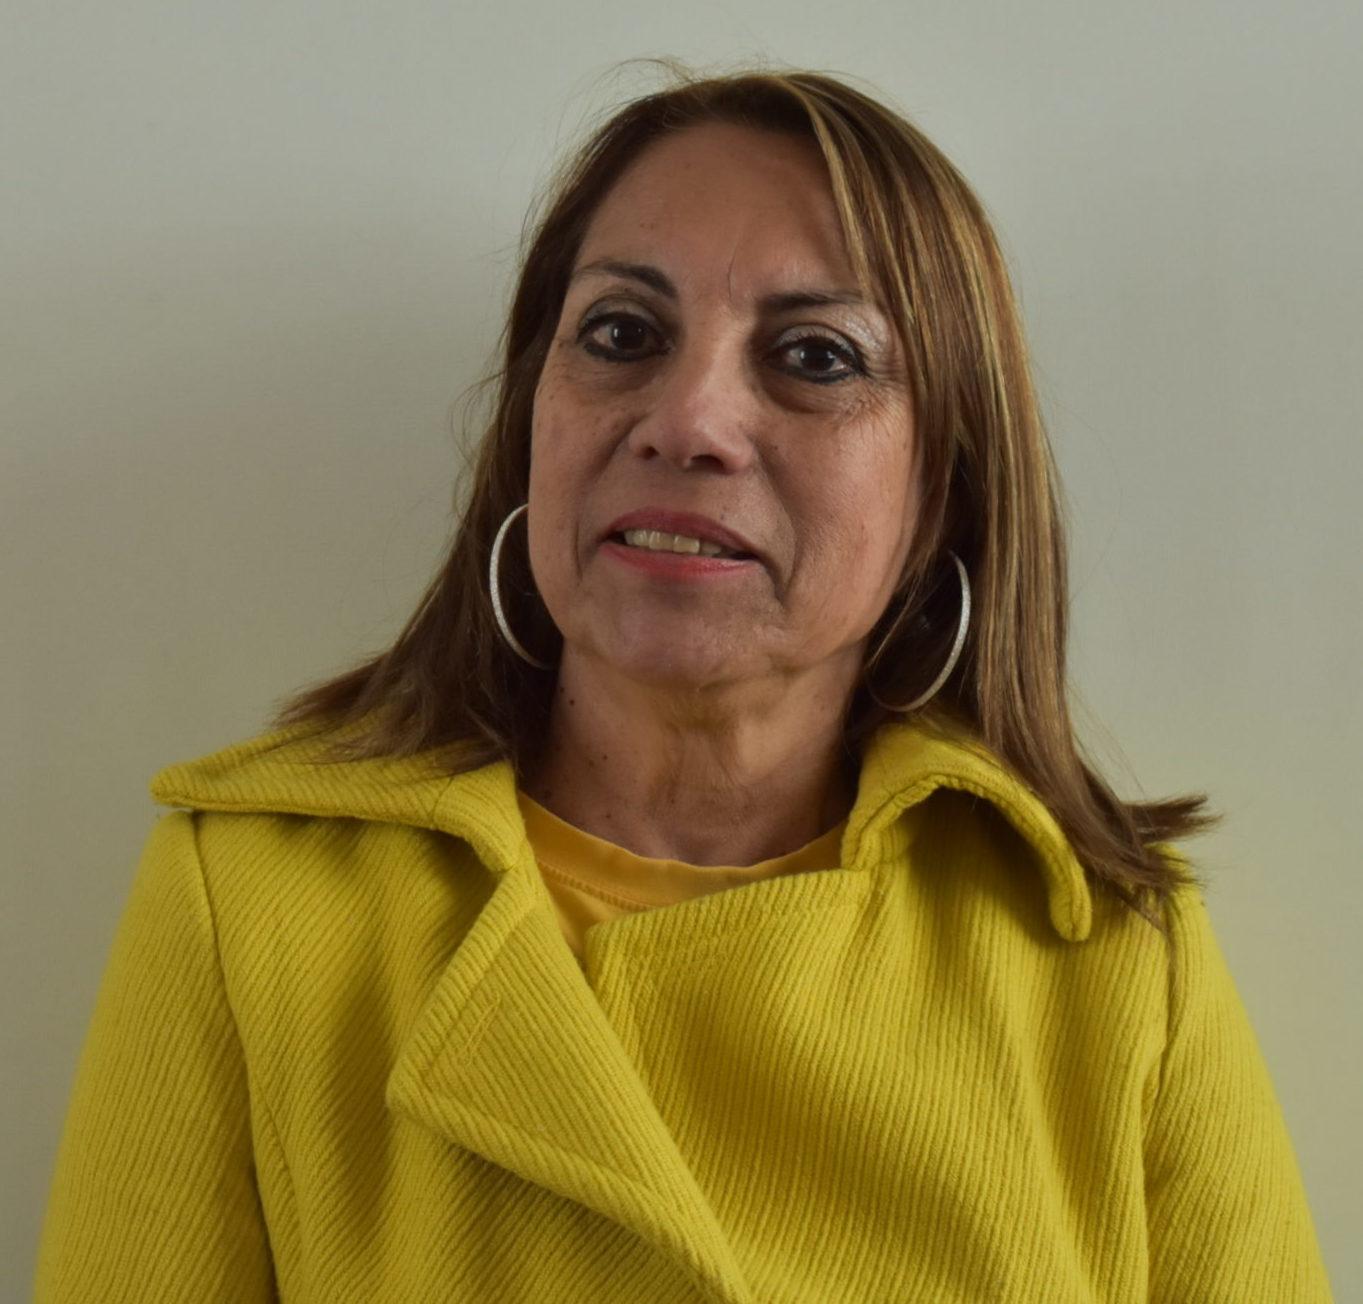 Rosa Penna